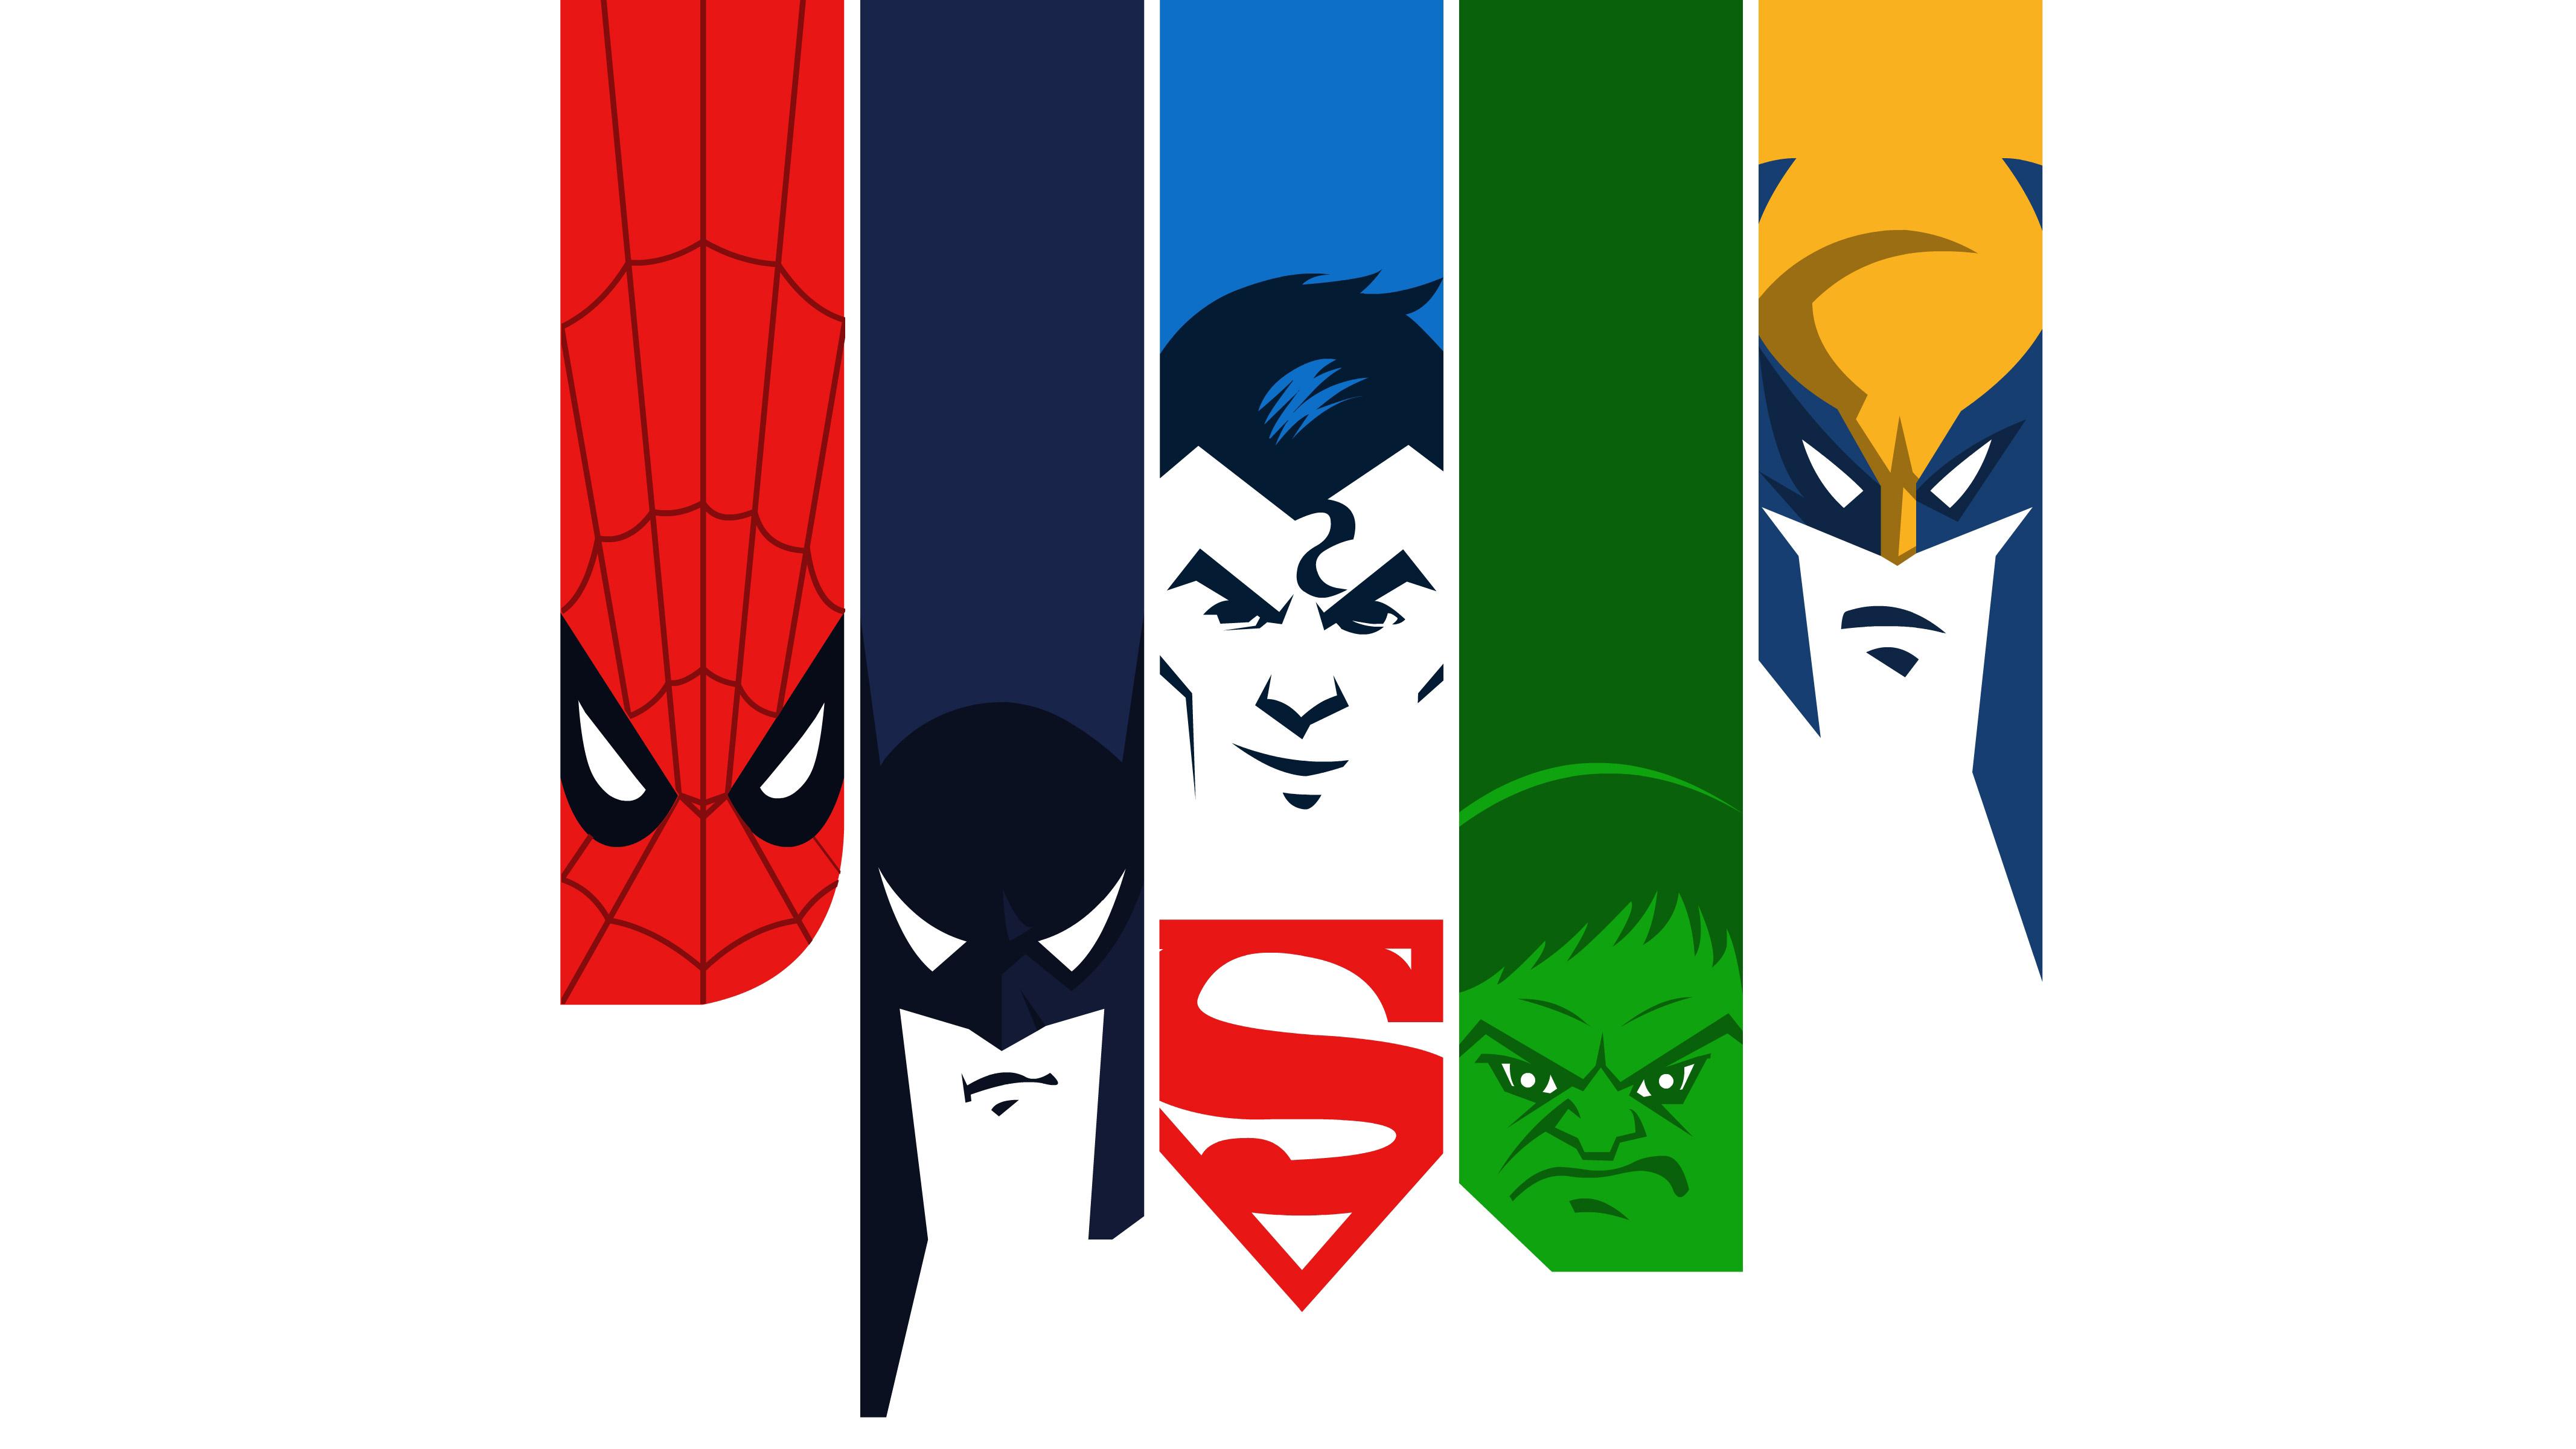 Superman and batman and spiderman logo